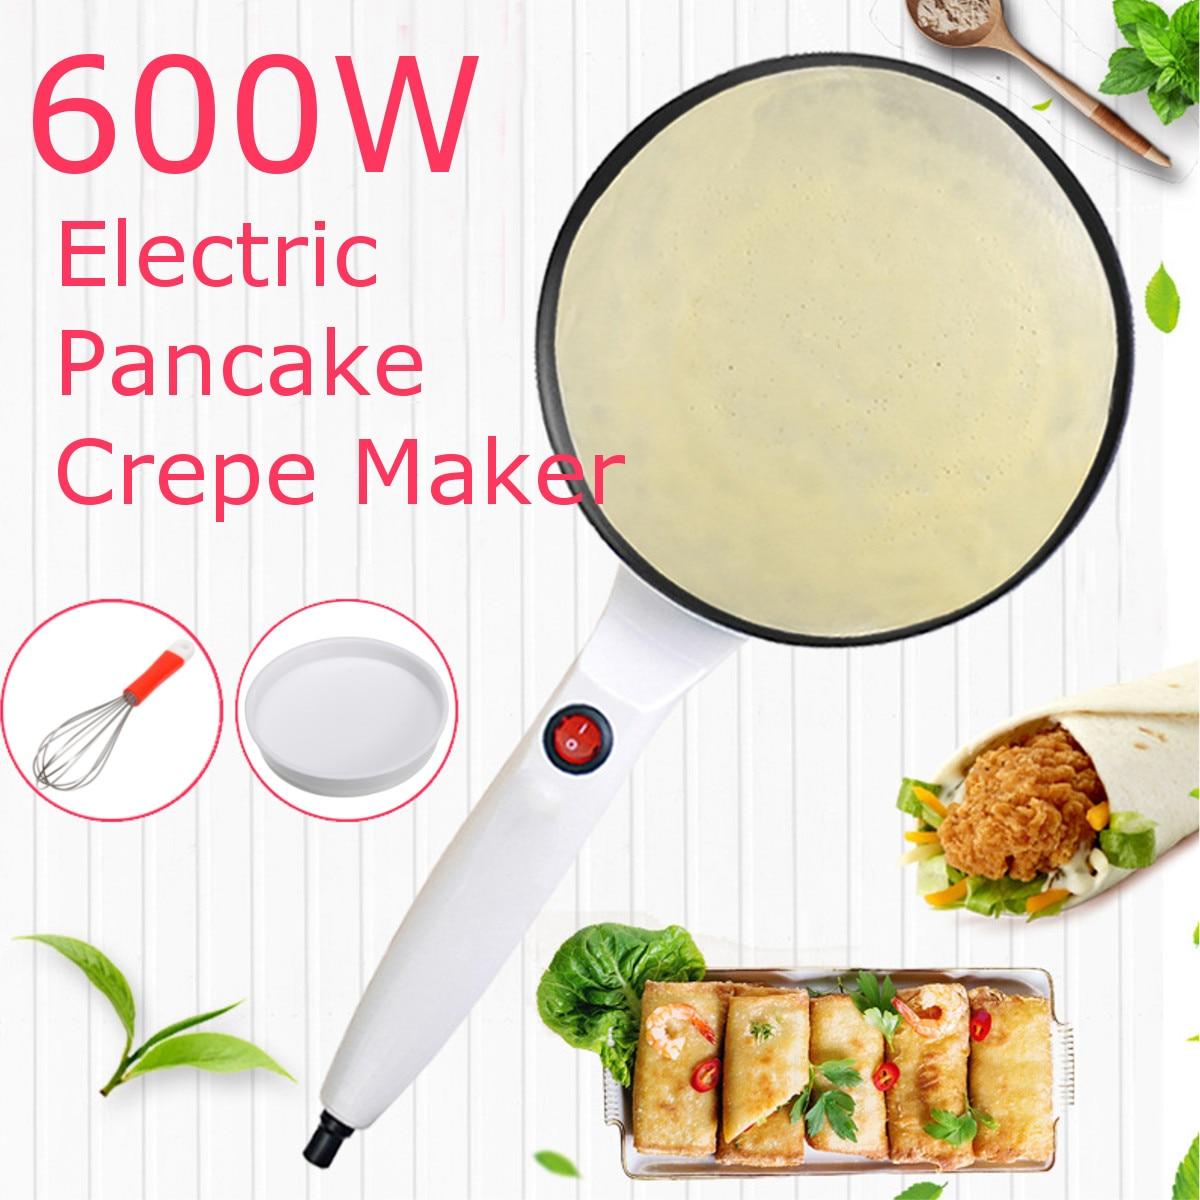 220V Non-stick Electric Crepe Pizza Maker Pancake Machine Non-stick Griddle Baking Pan Cake Machine Kitchen Cooking Tools Crepe